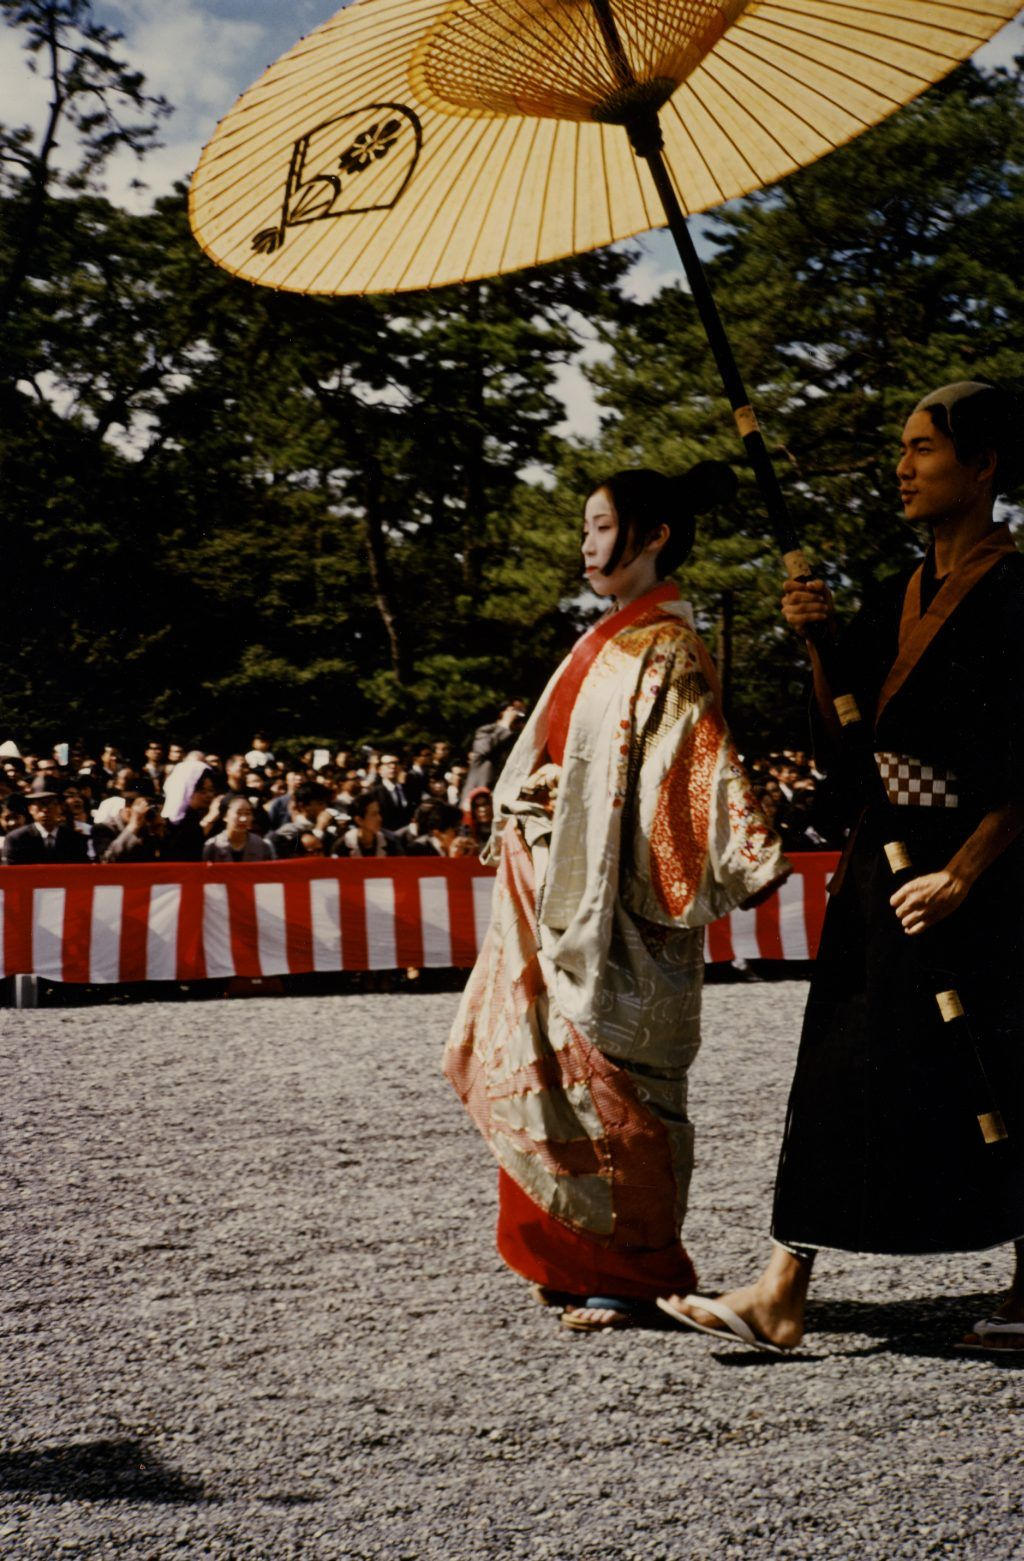 Another Heian Female Personality in the Jidai Matsuri Procession